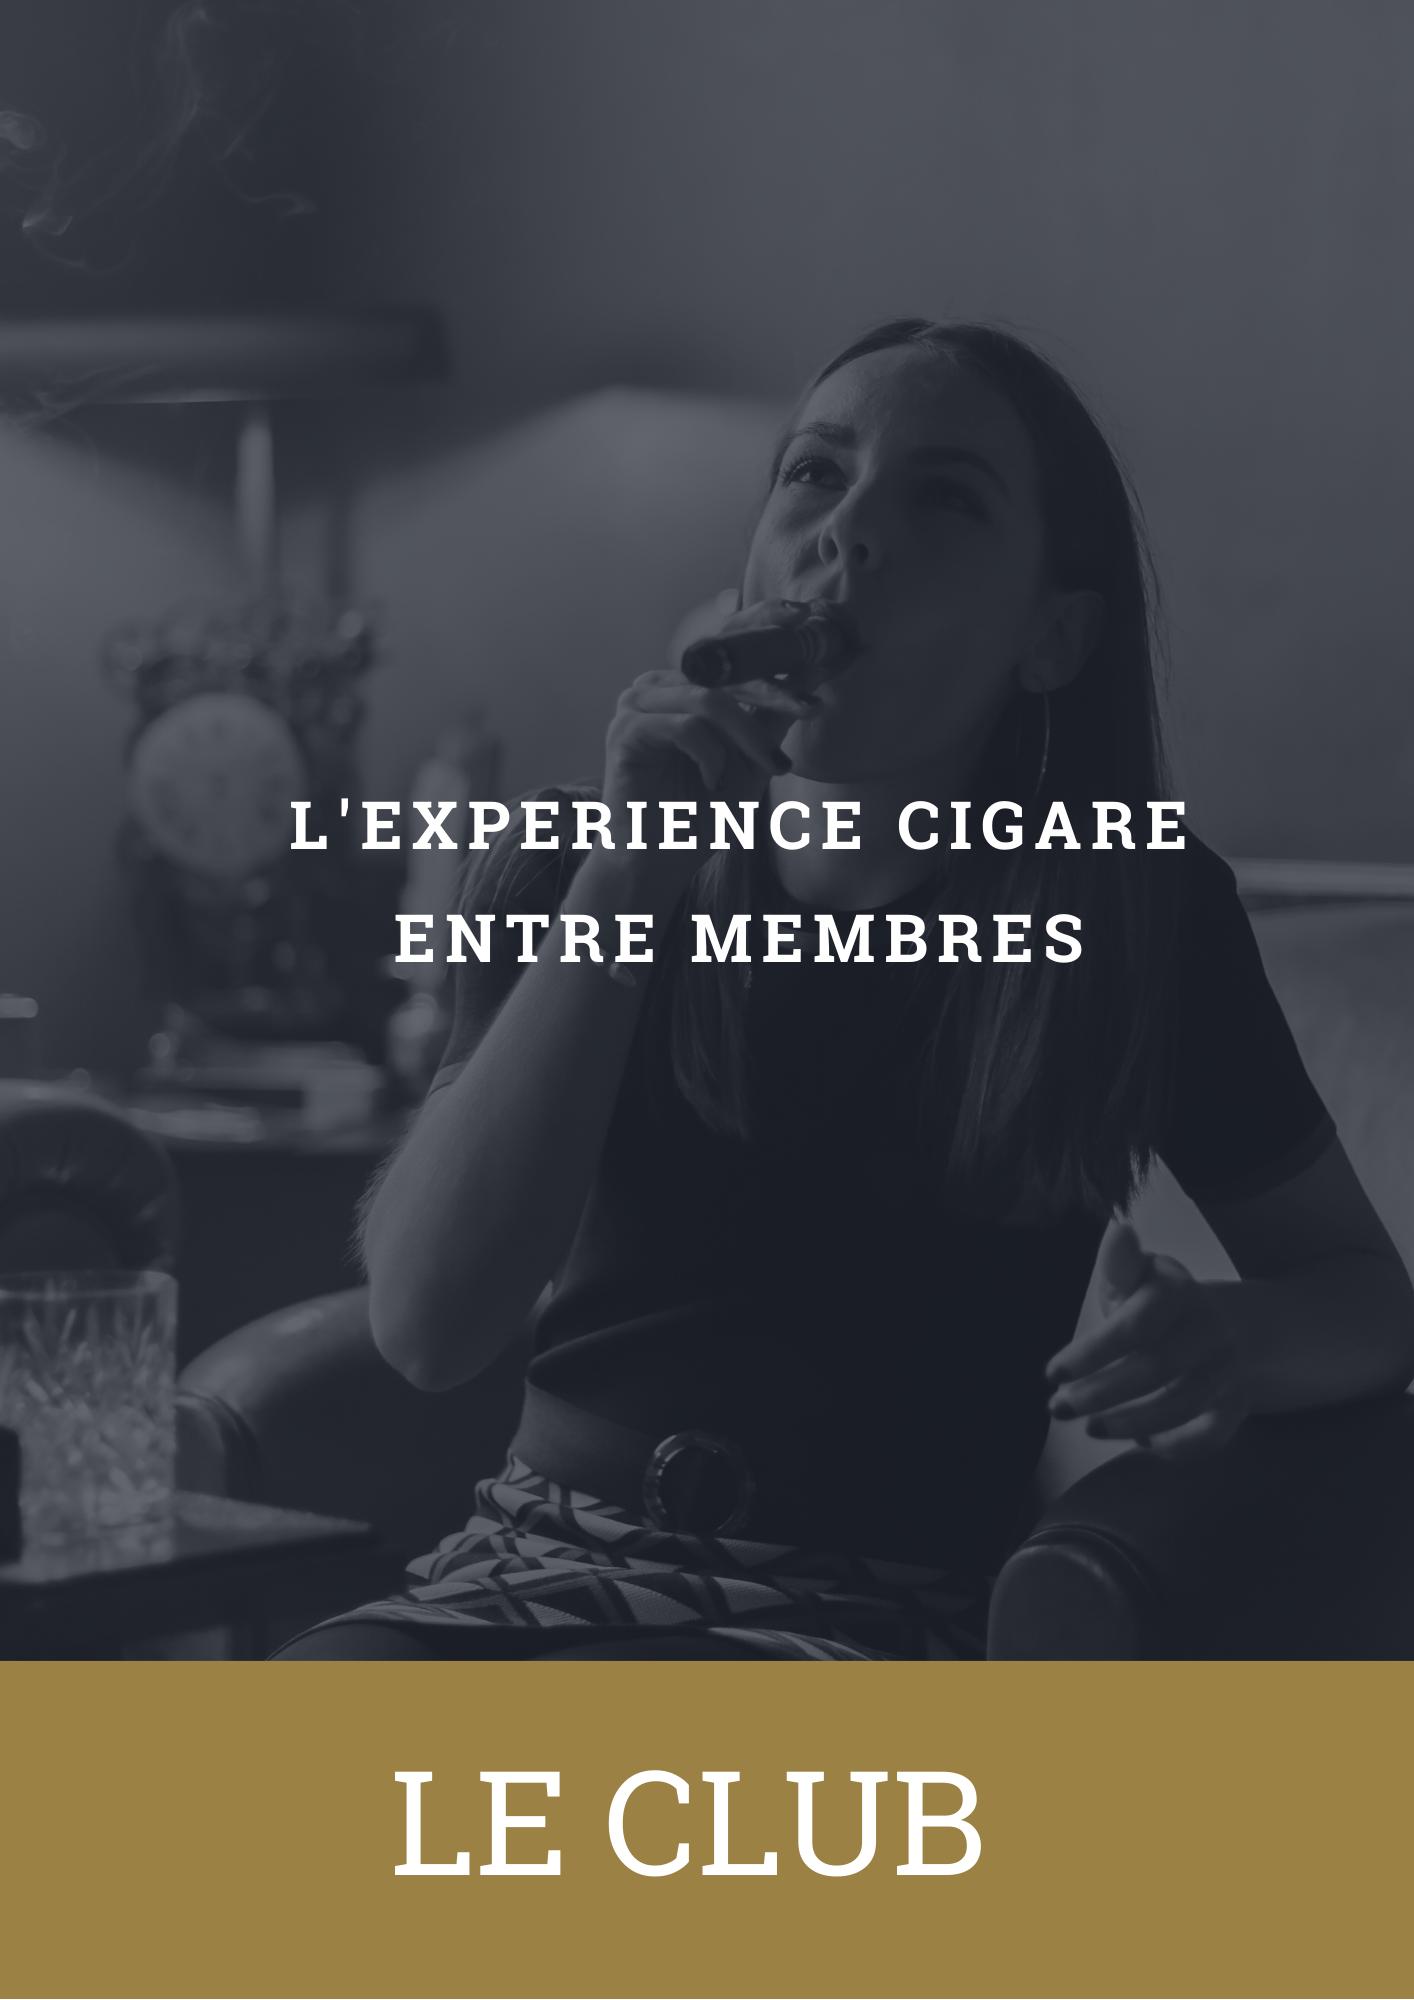 Le Club - CIGAR SOCIAL CLUB